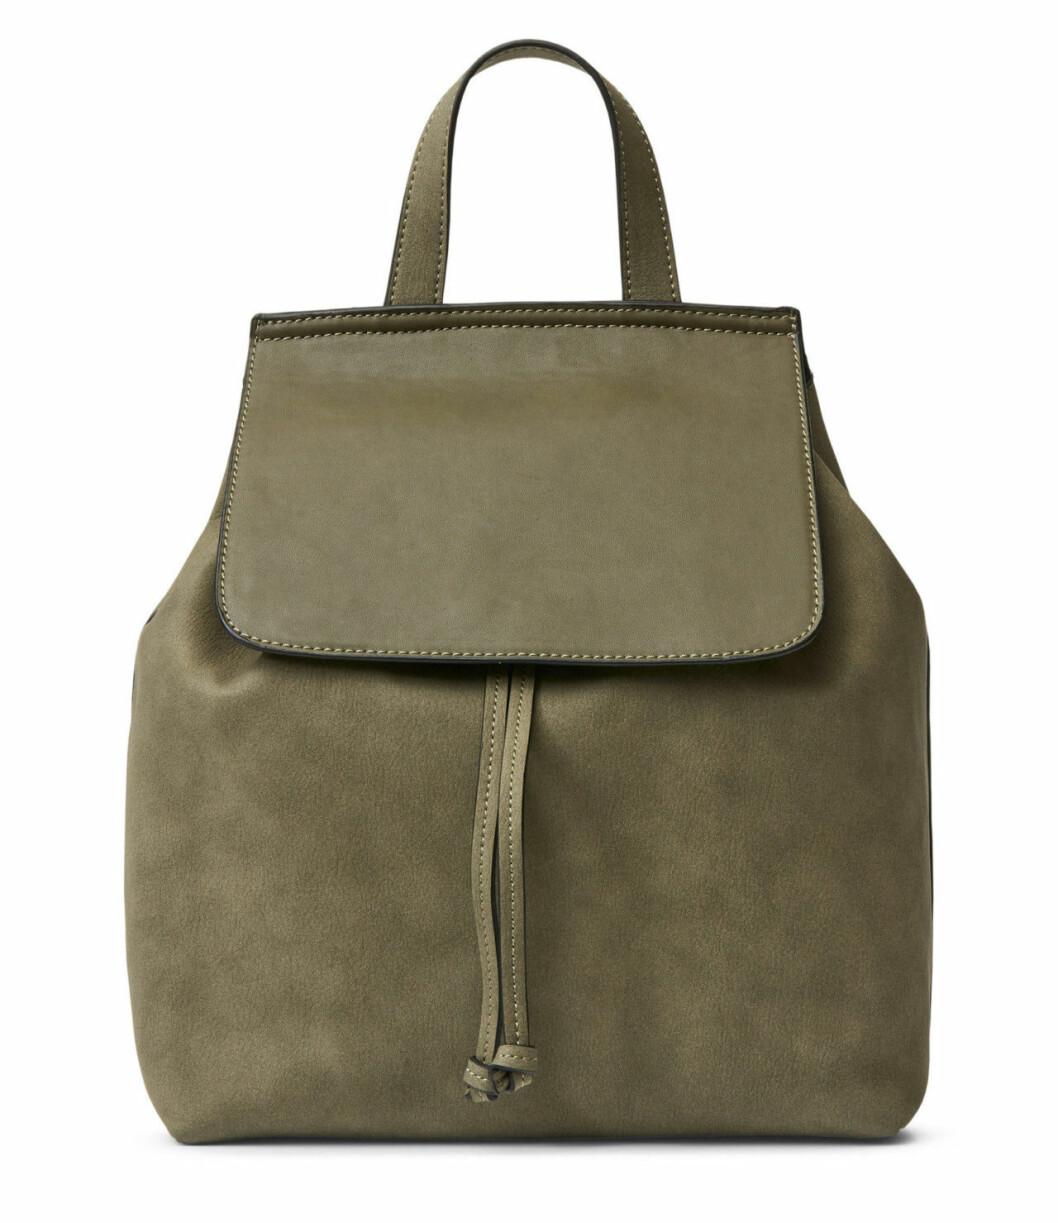 Grön ryggsäck